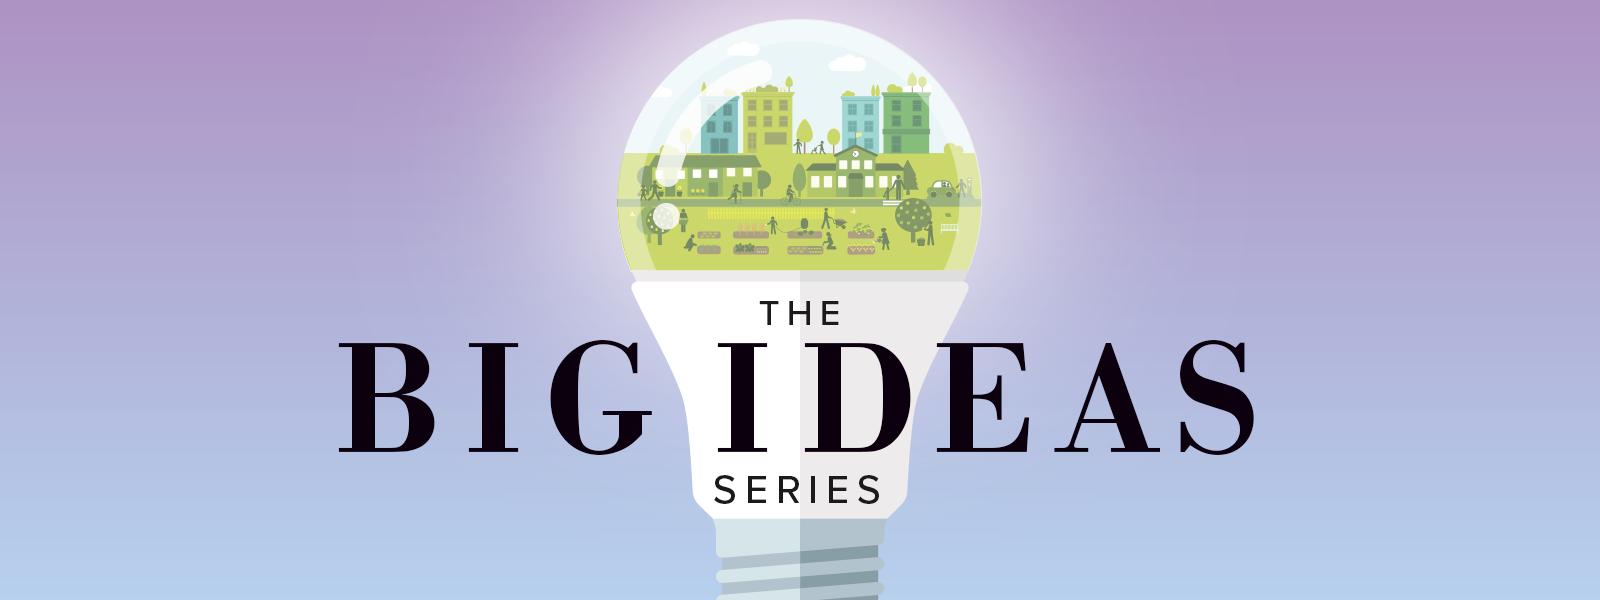 The Big Ideas Series